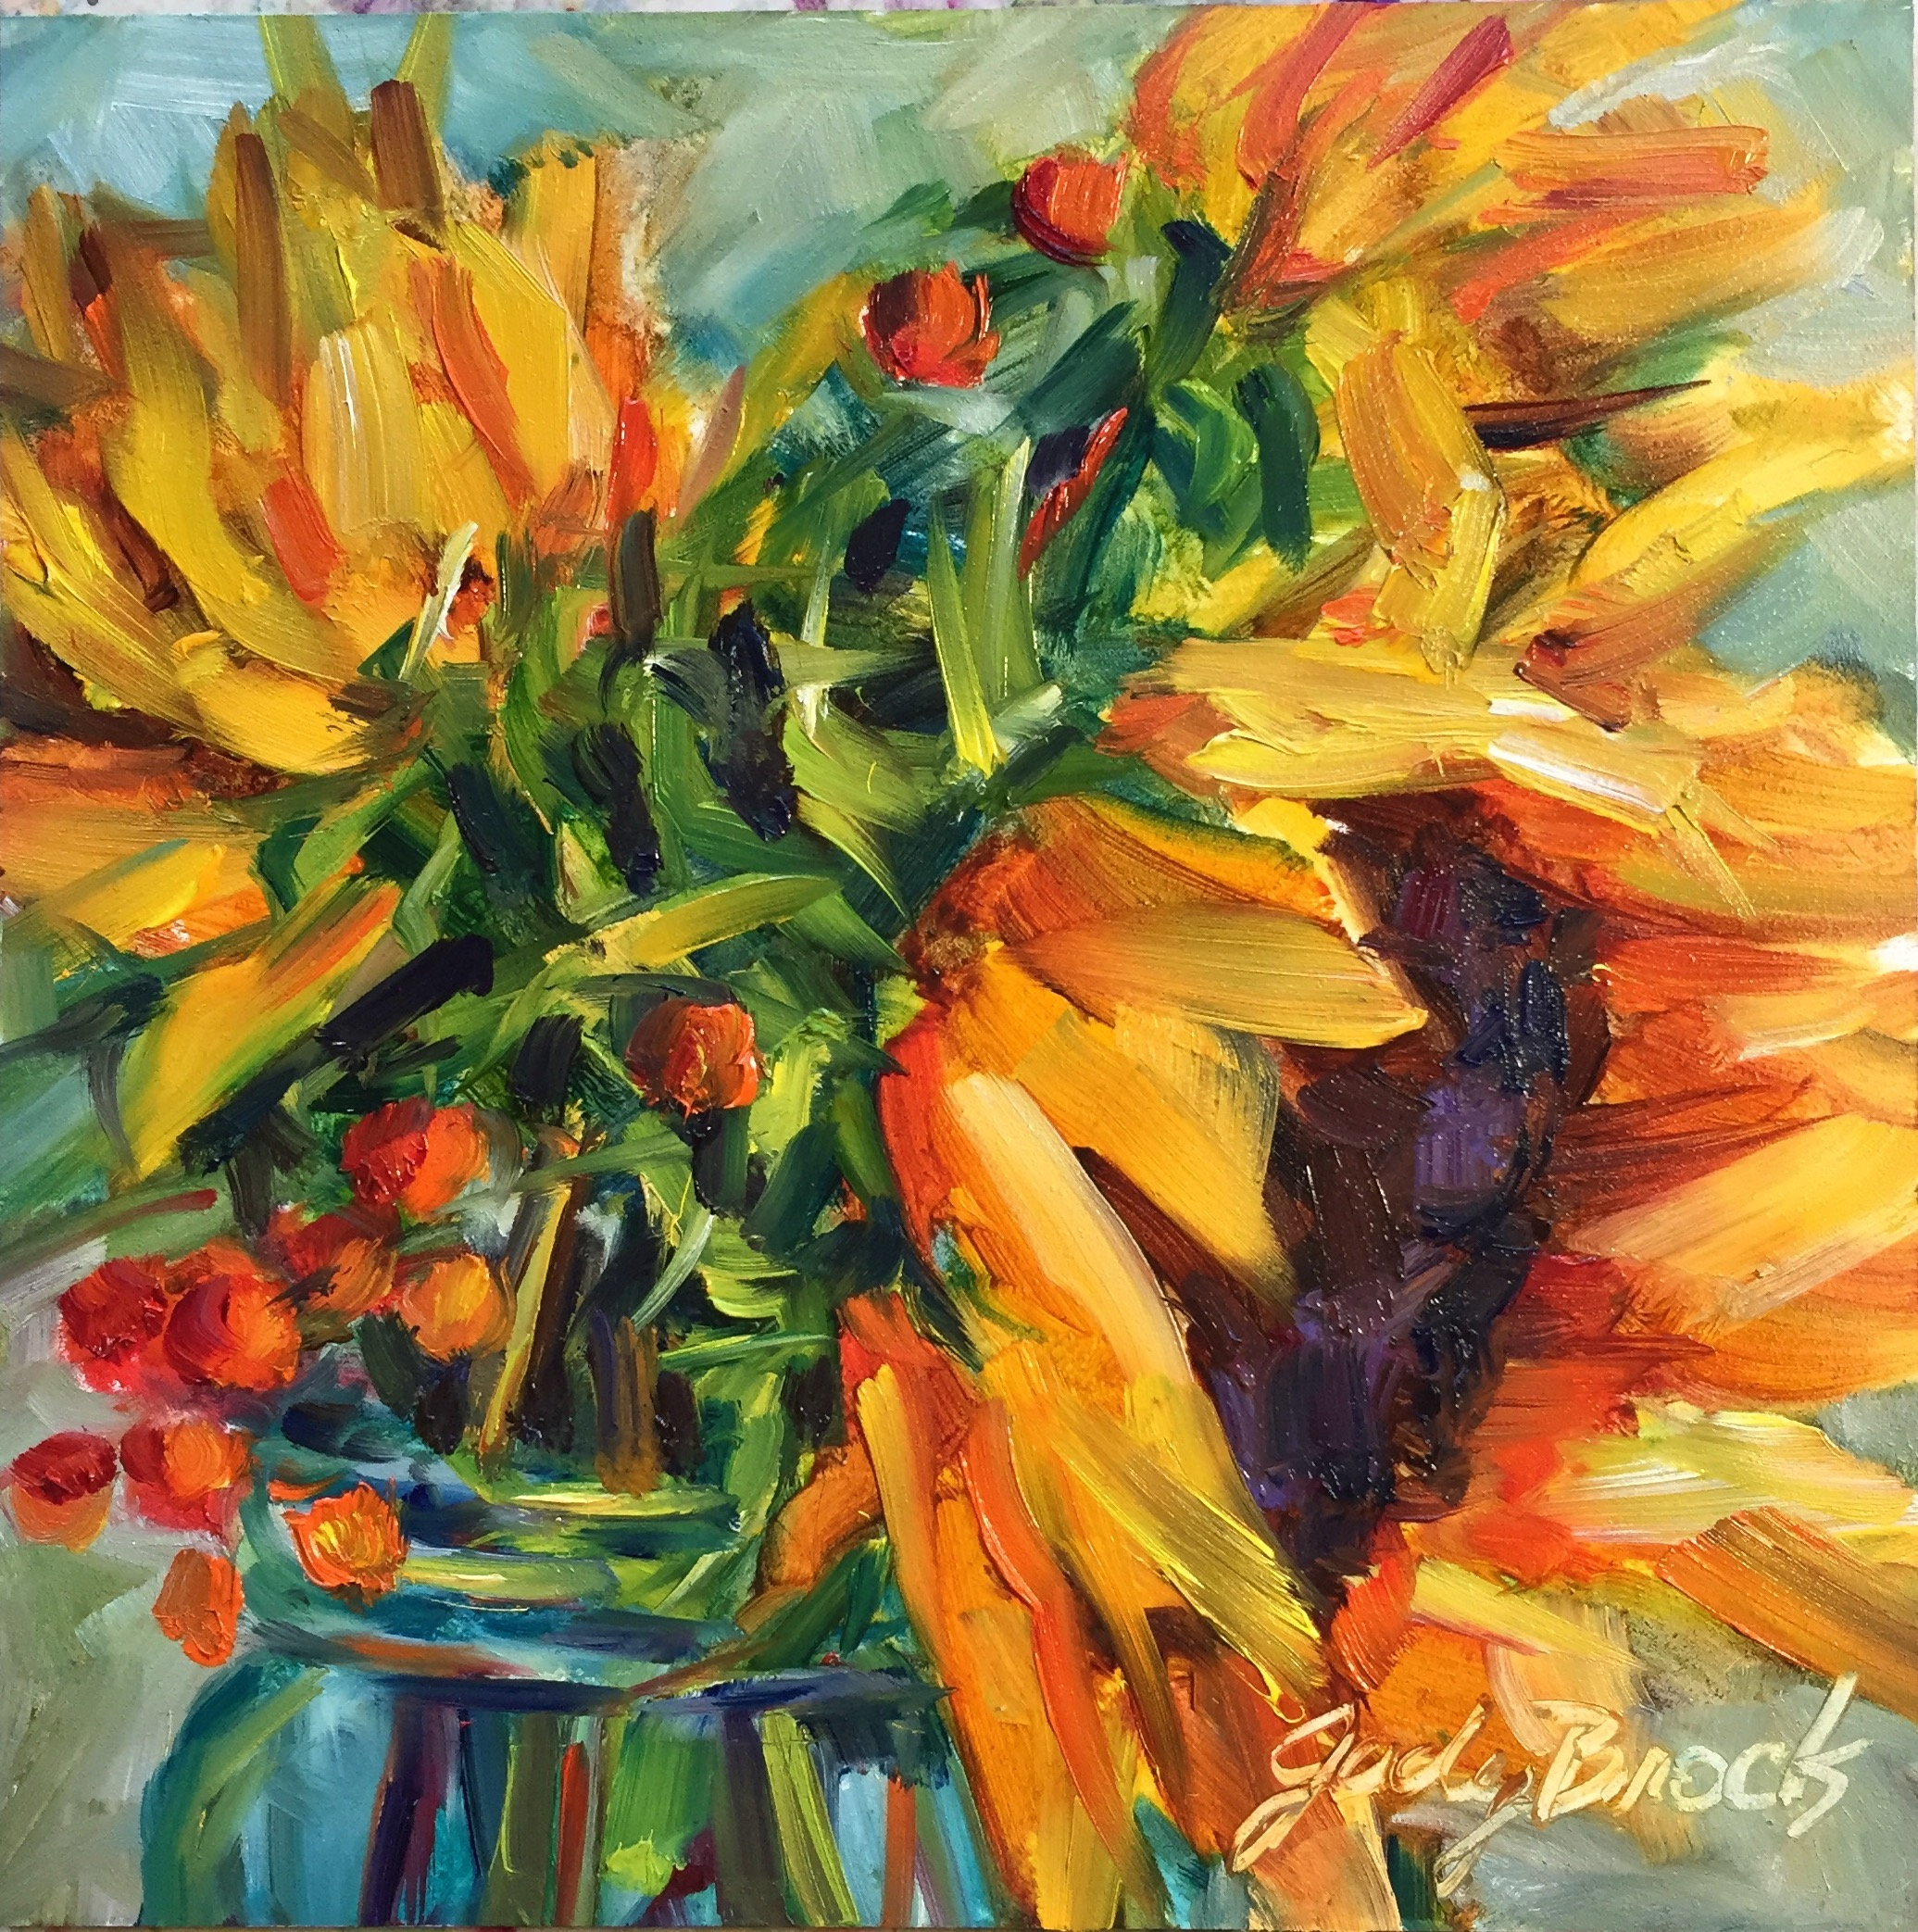 Sunflowers and Berries